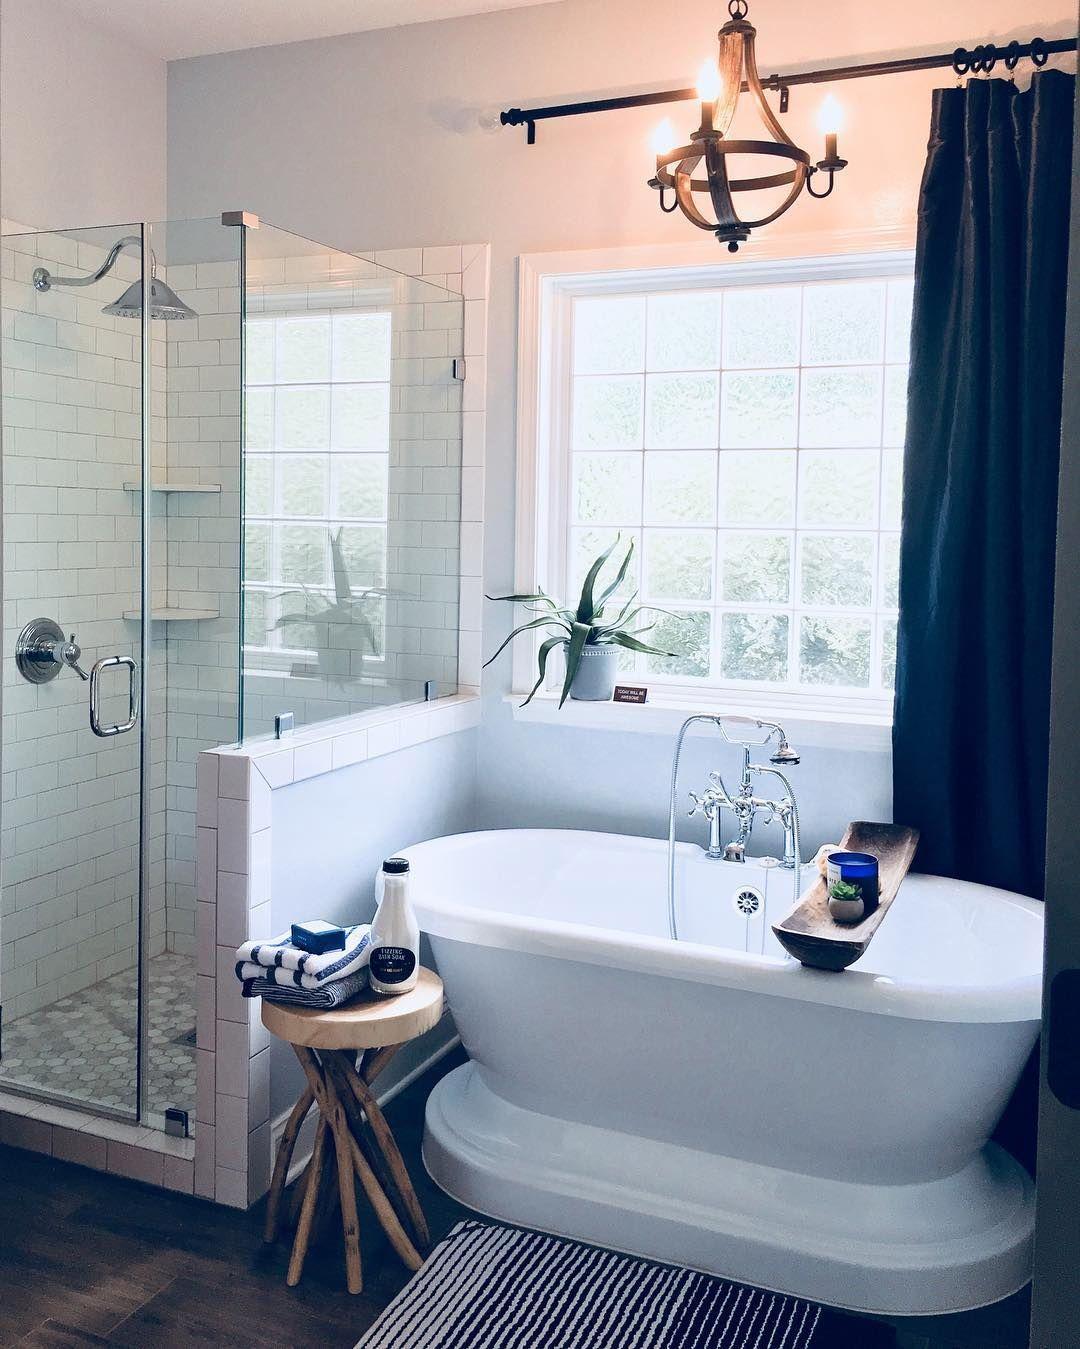 Mansfield Acrylic Double Ended Pedestal Tub Rim Drillings Master Bathroom Renovation Bathrooms Remodel Bathroom Remodel Designs